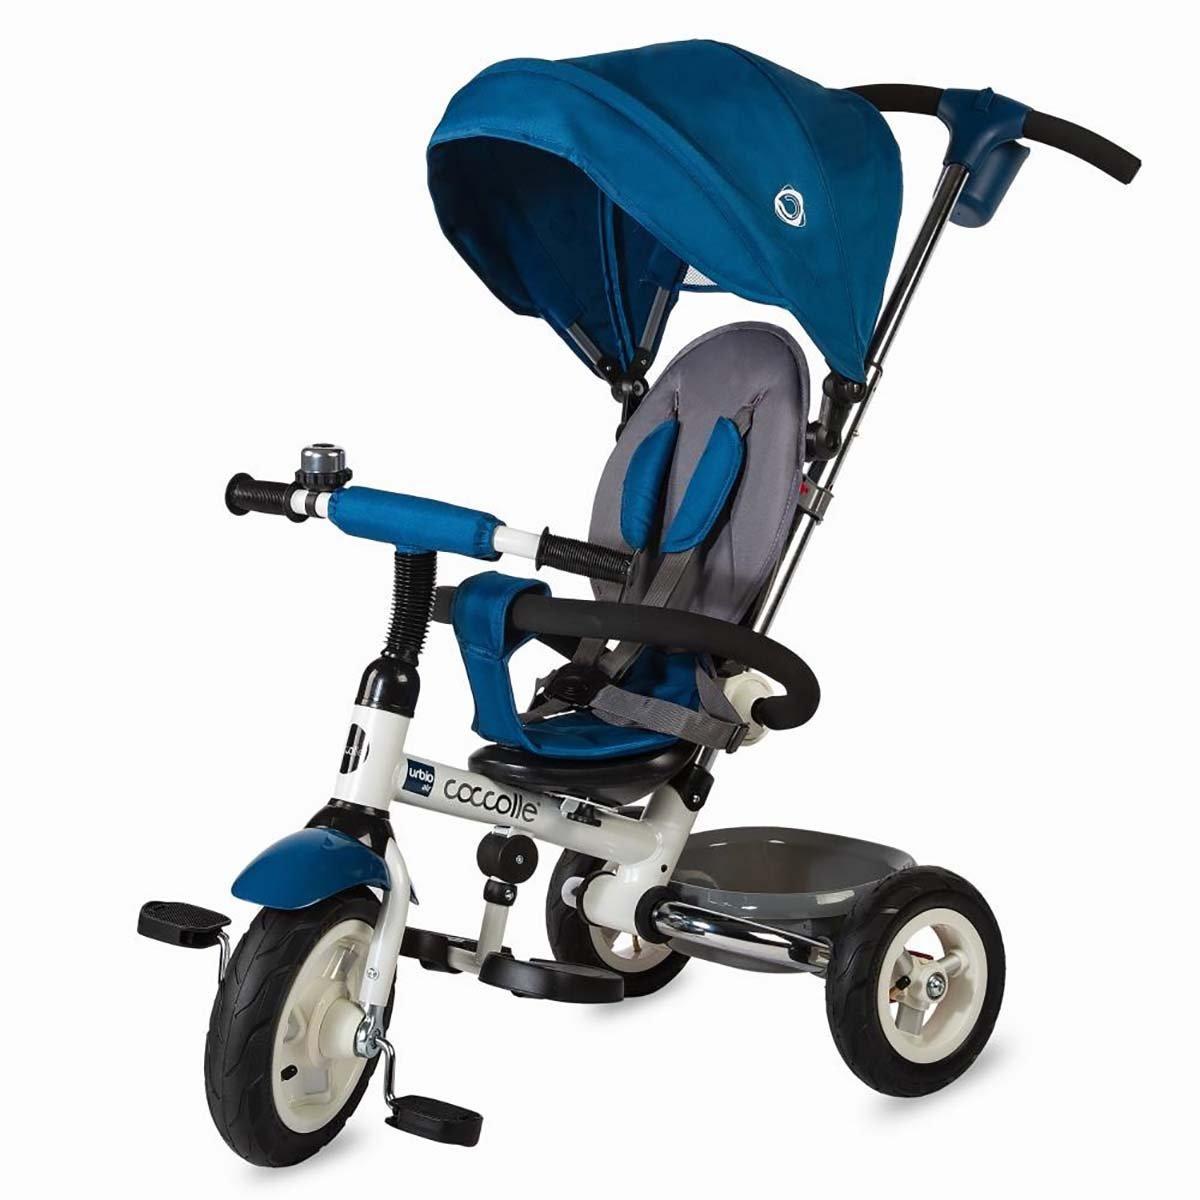 Tricicleta pliabila Urbio Air Coccolle, Albastru imagine